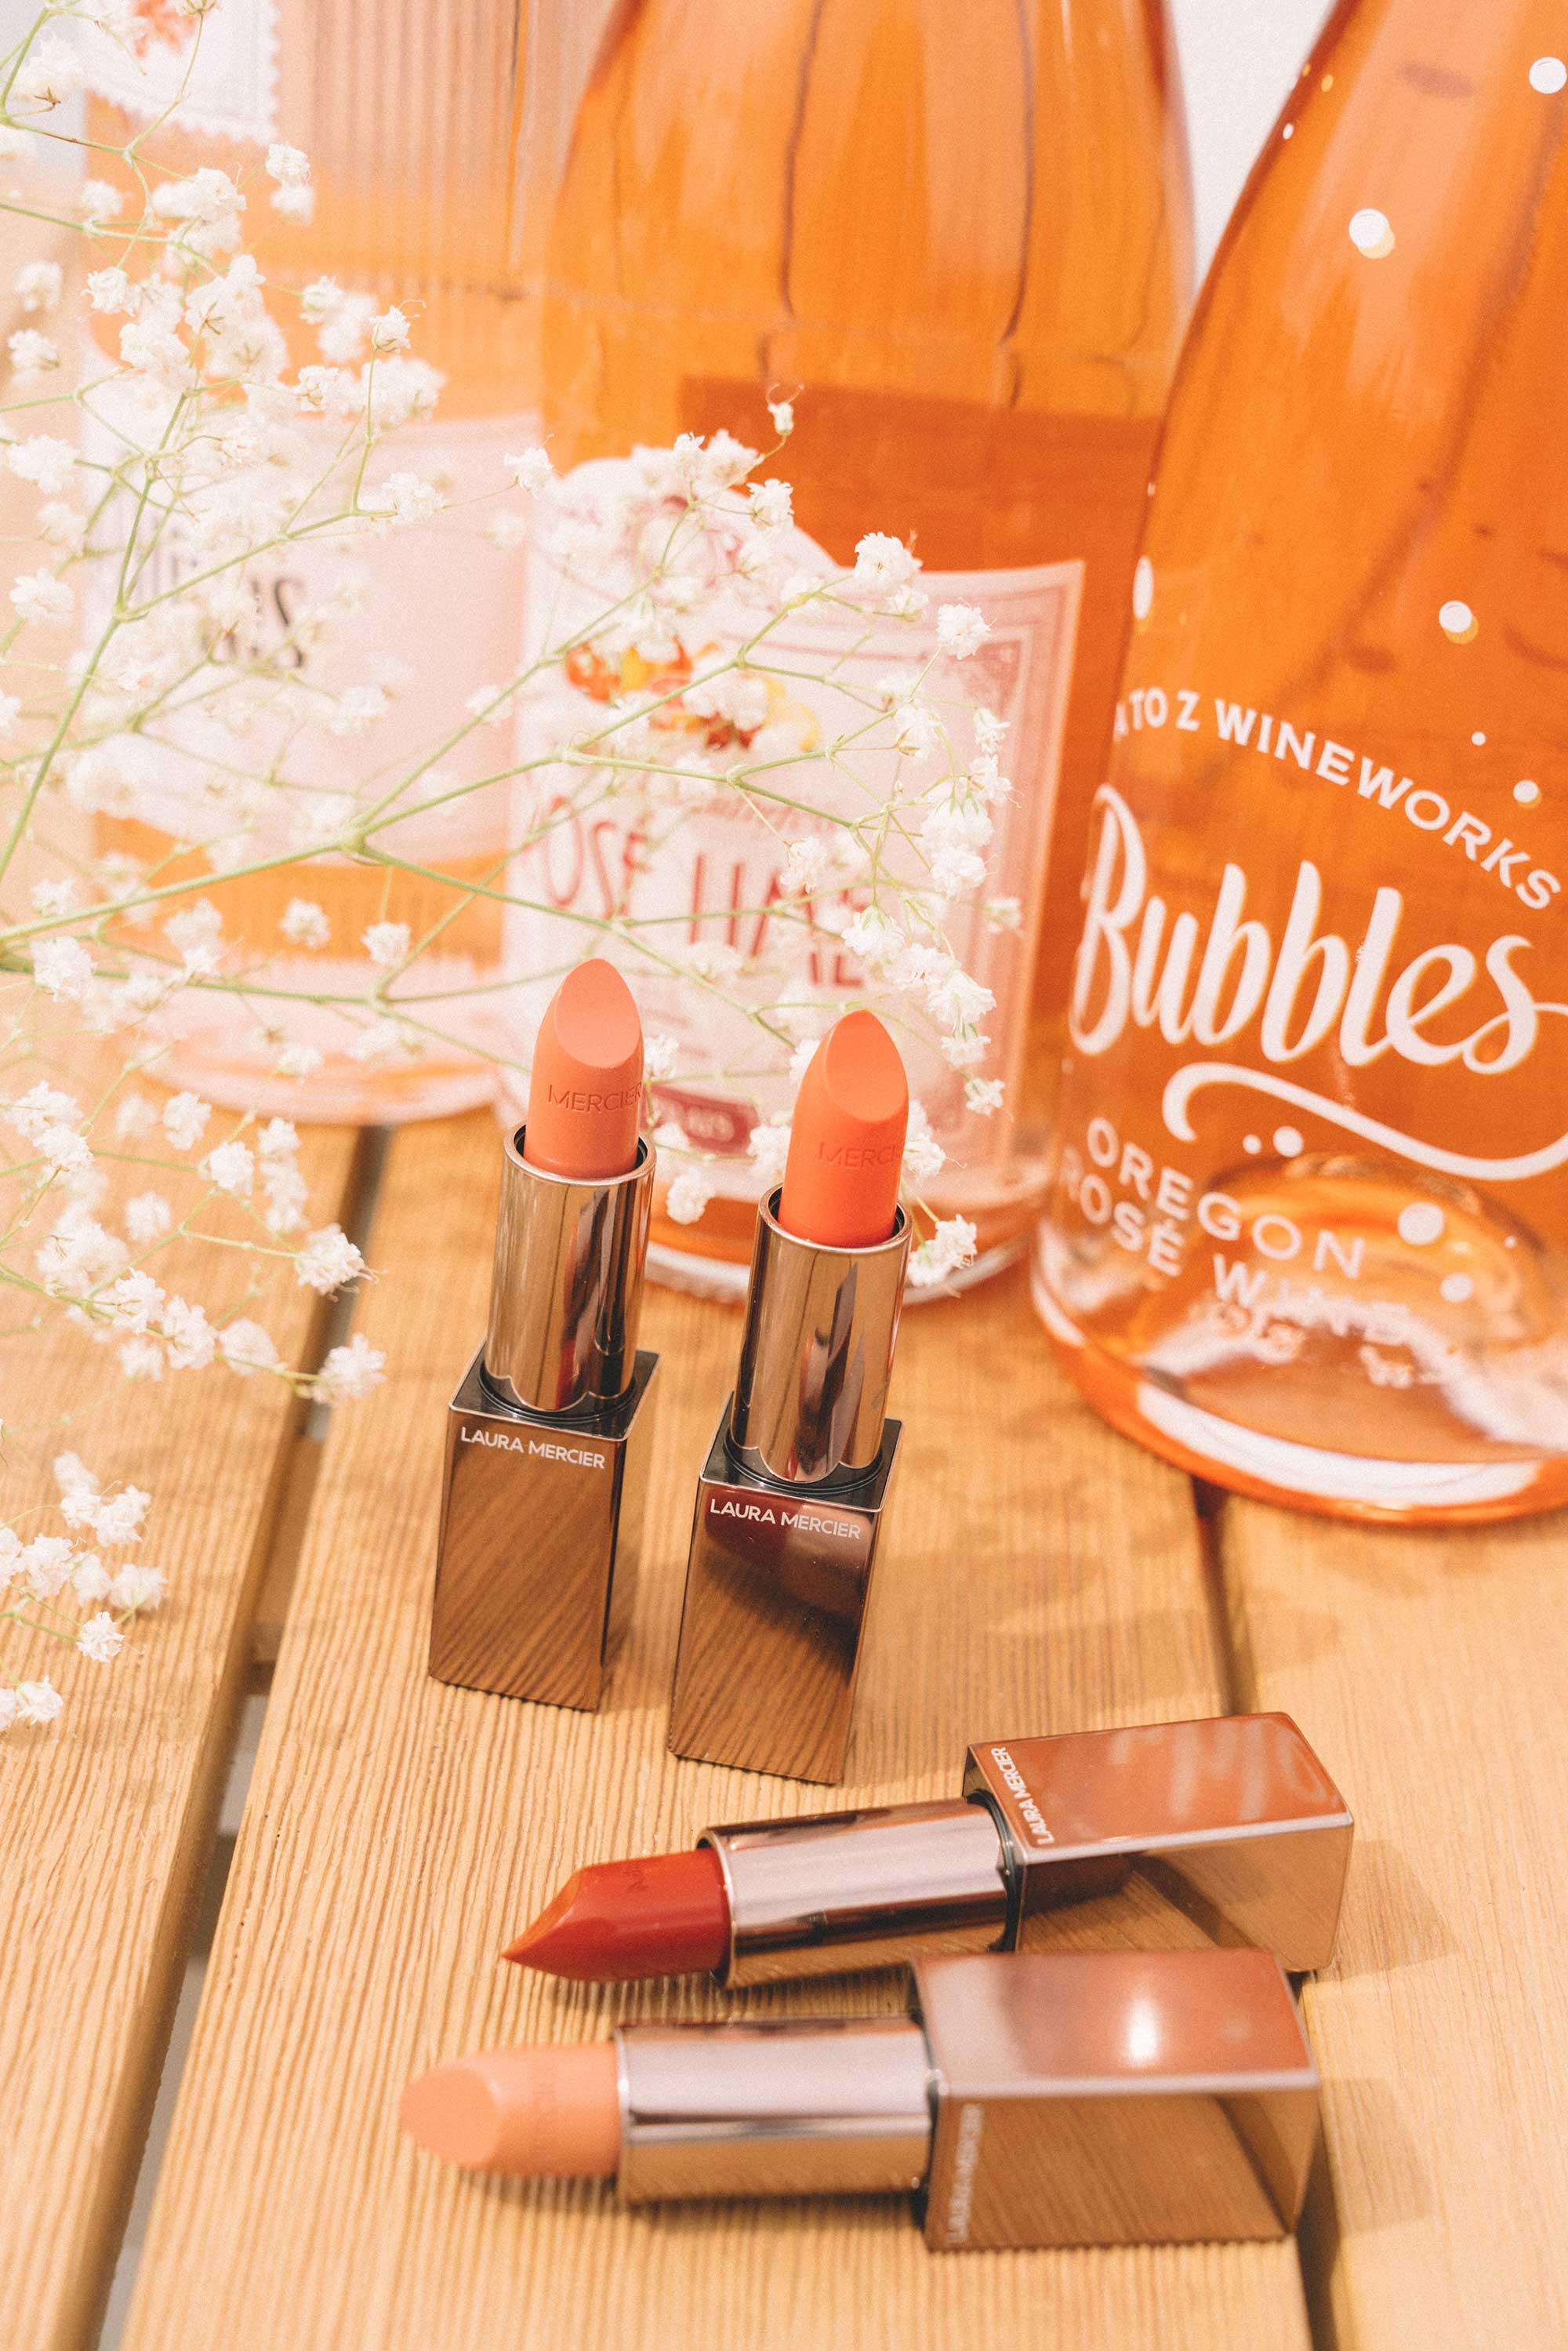 Laura-Mercier-Rouge-Essential-Silky-Creme-Lipstick2.jpg